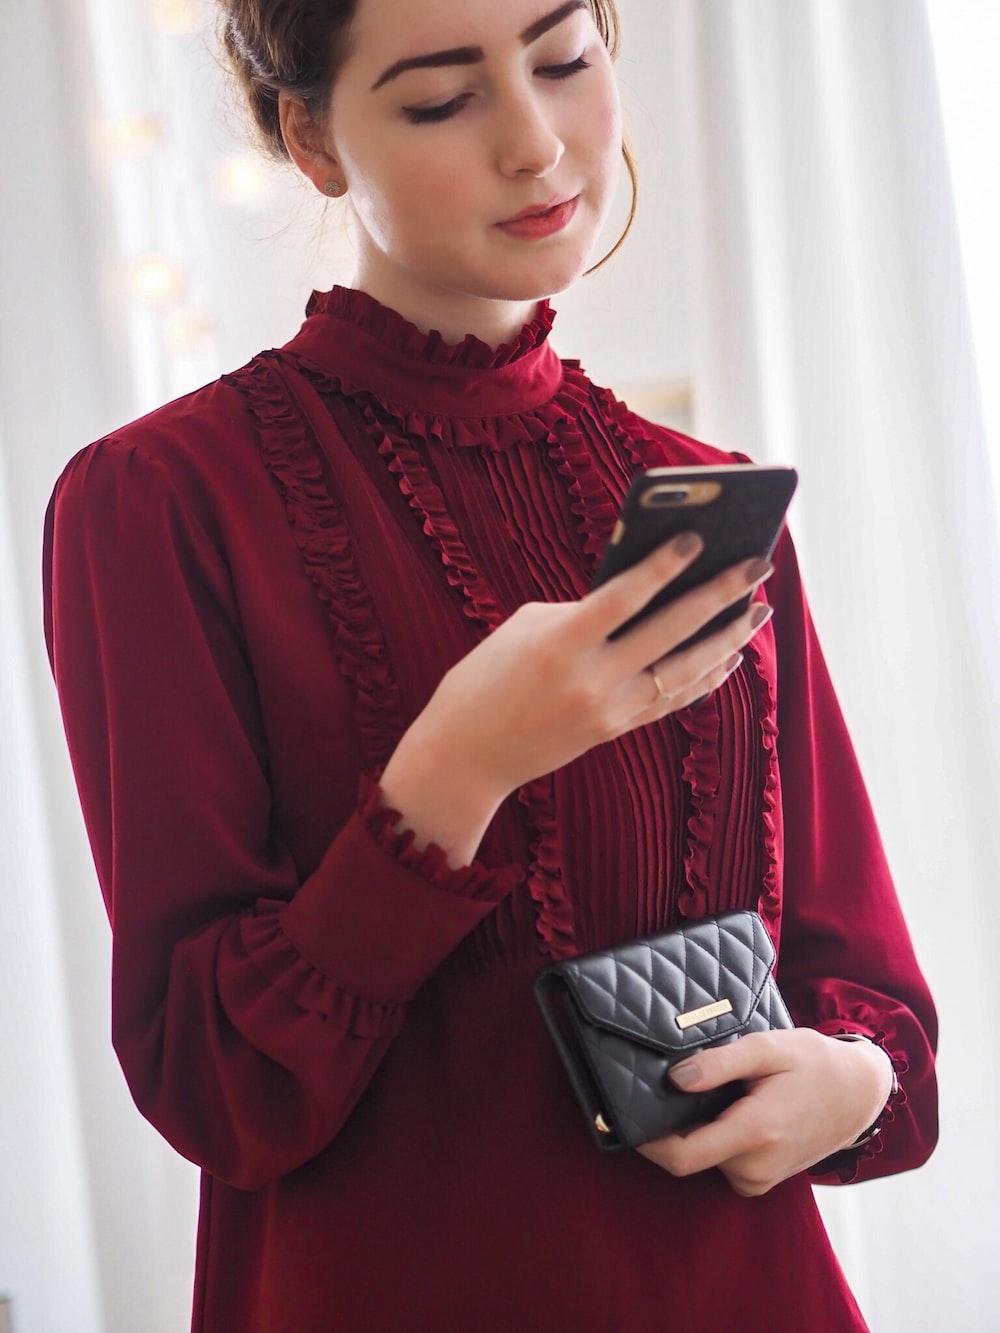 women's red long-sleeved blouse